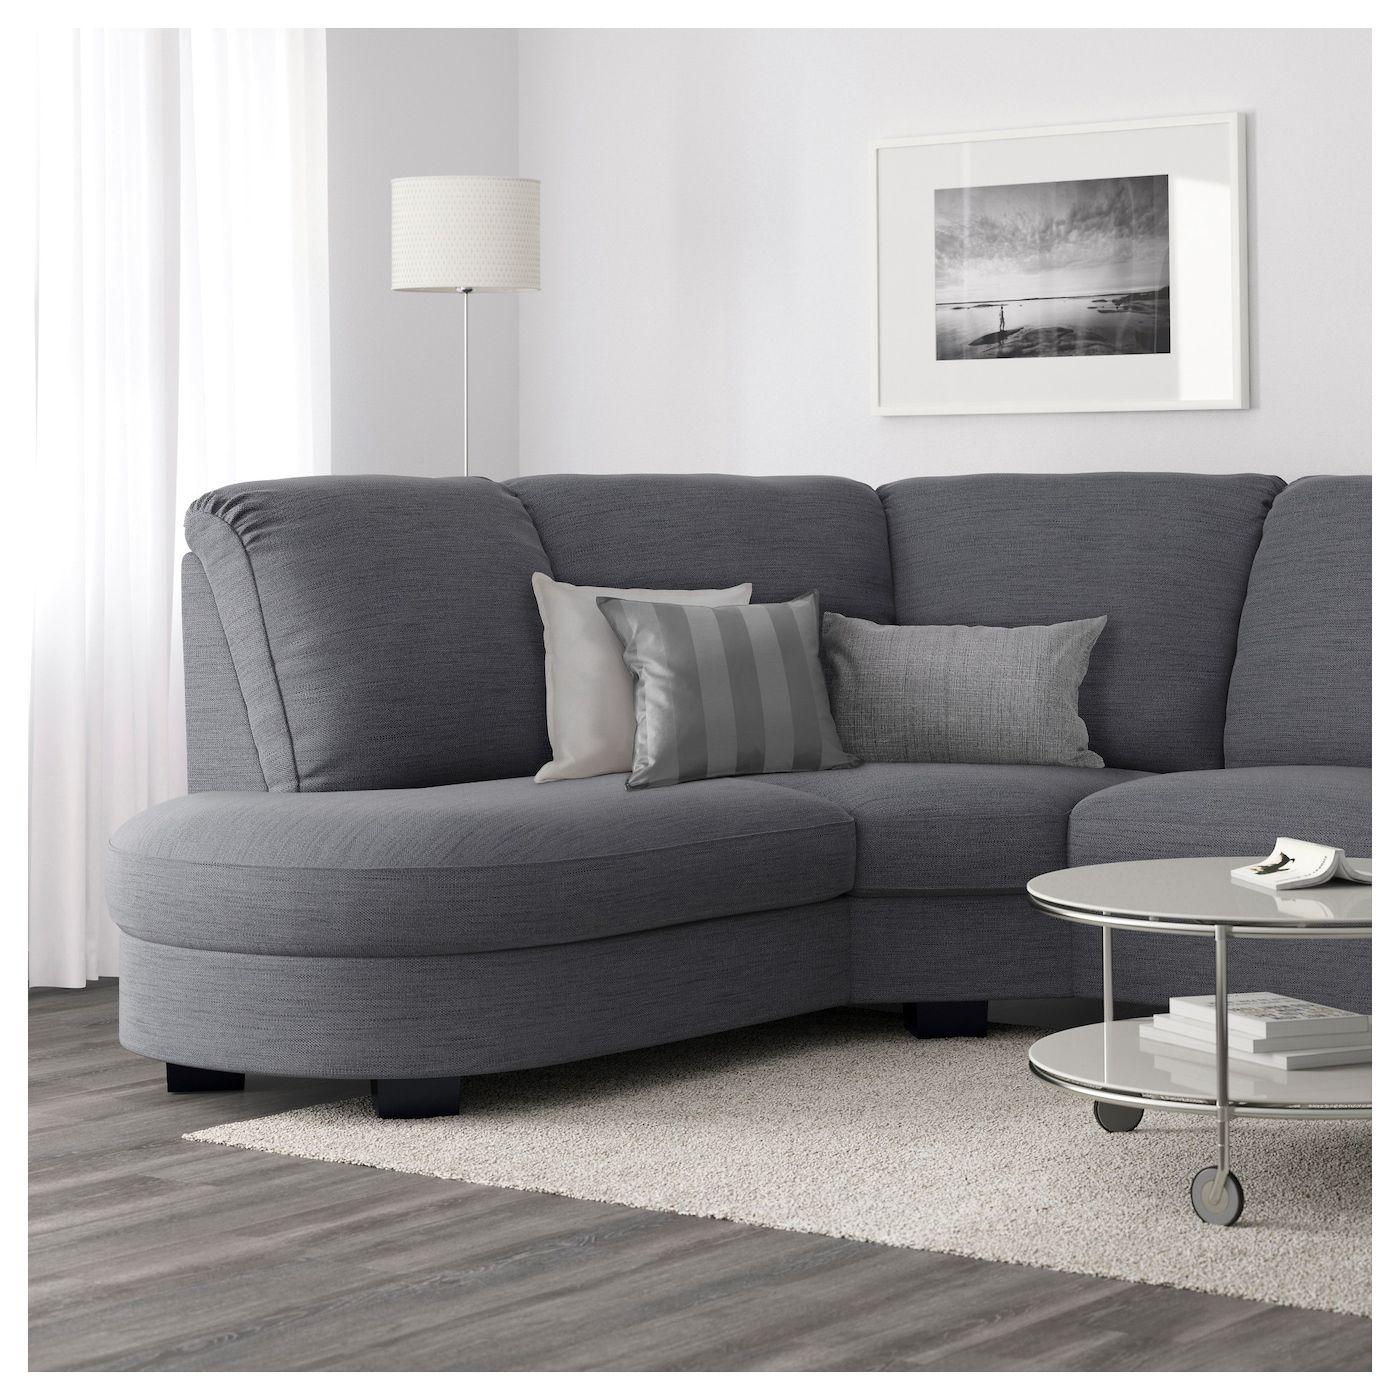 Tidafors Hensta Grey Corner Sofa With Arm Right Ikea Small Corner Sofa Corner Sofa Corner Sofa Living Room